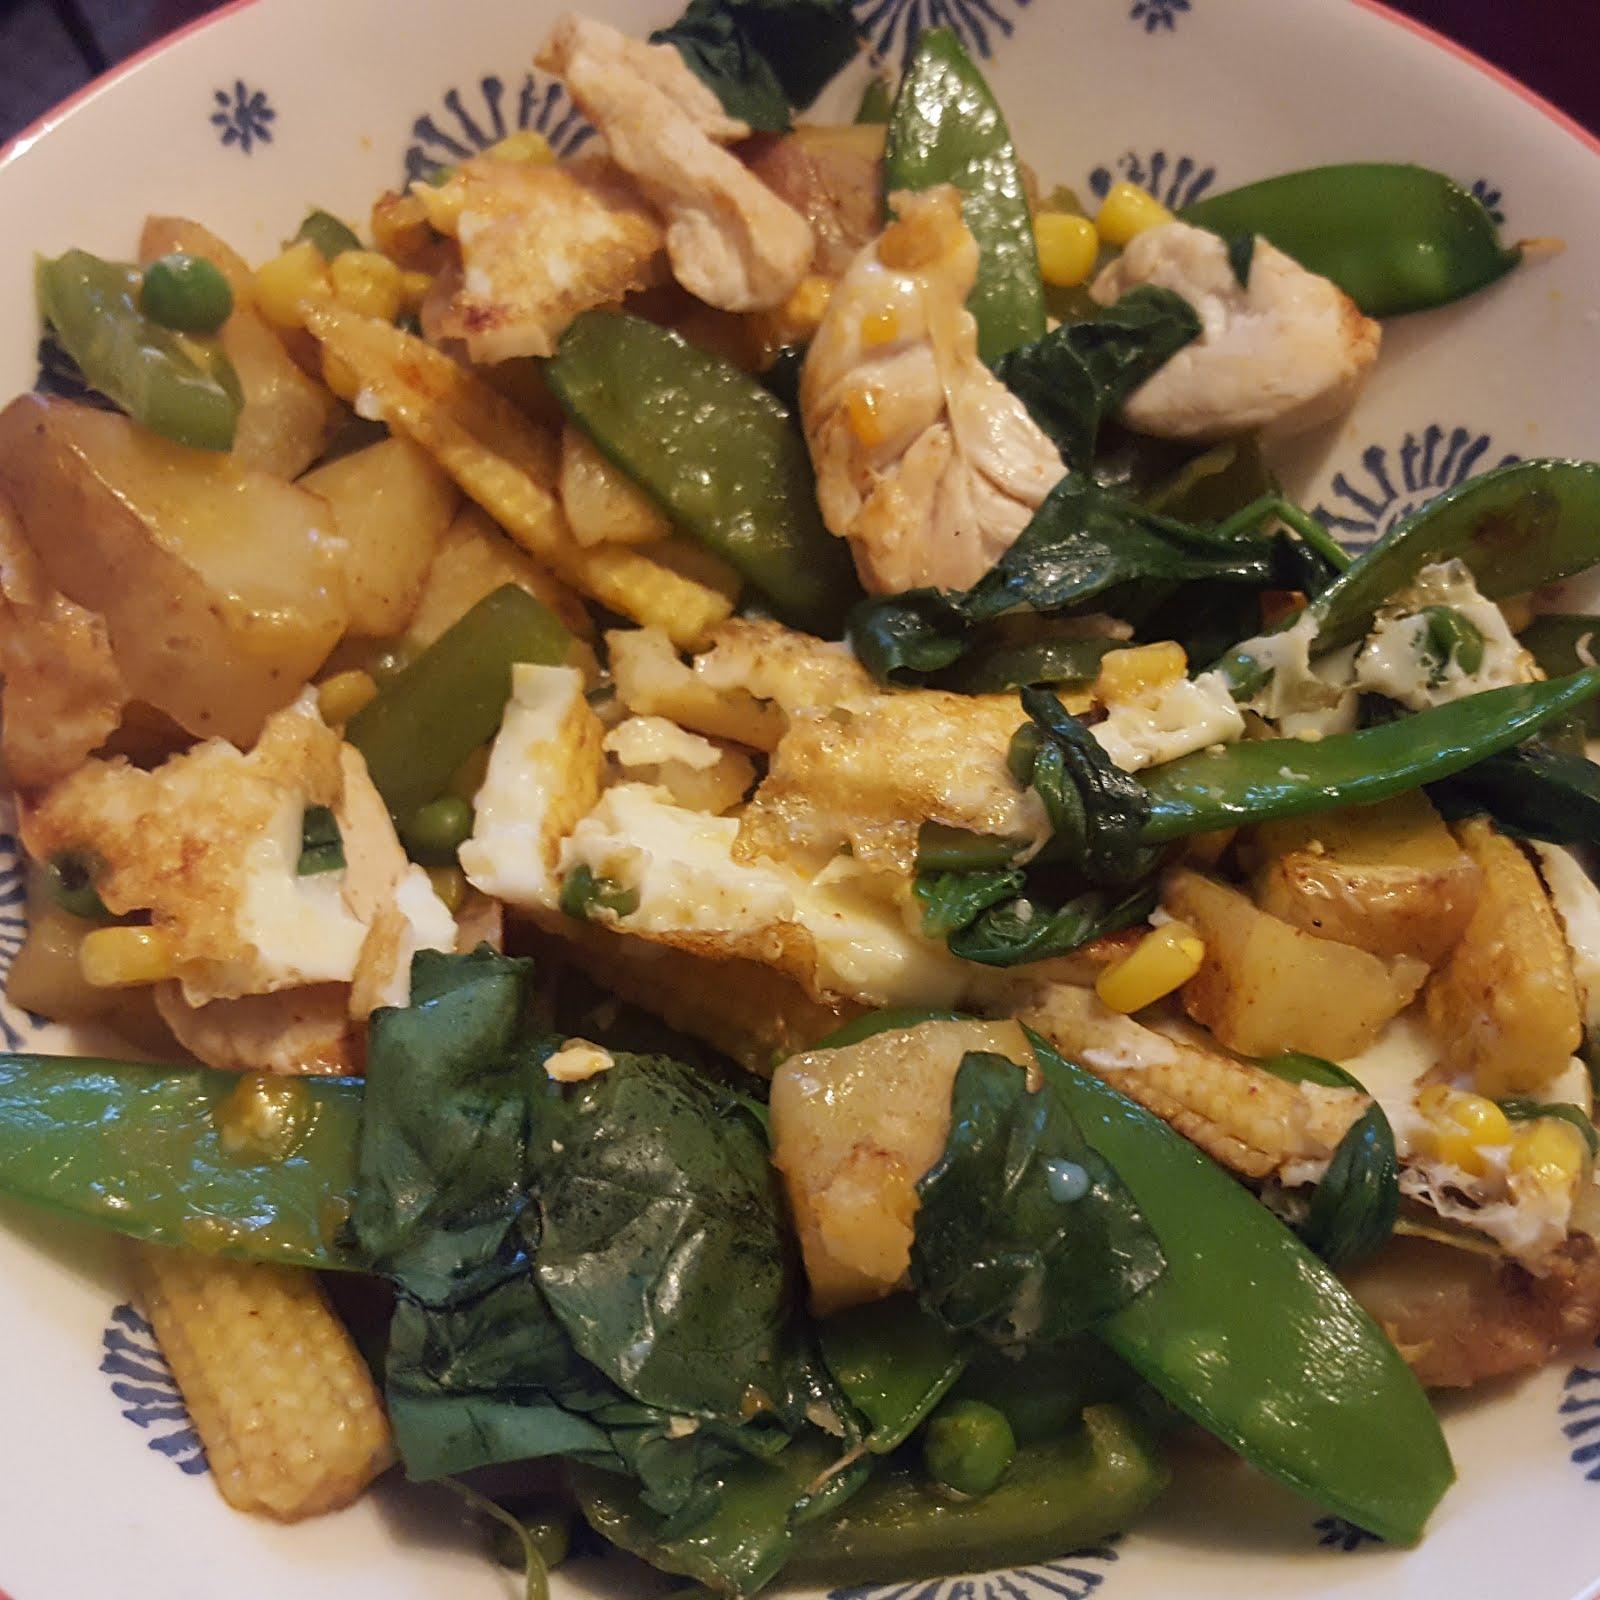 Joe Wicks Lean in 15 Chicken and potato hash potatoe